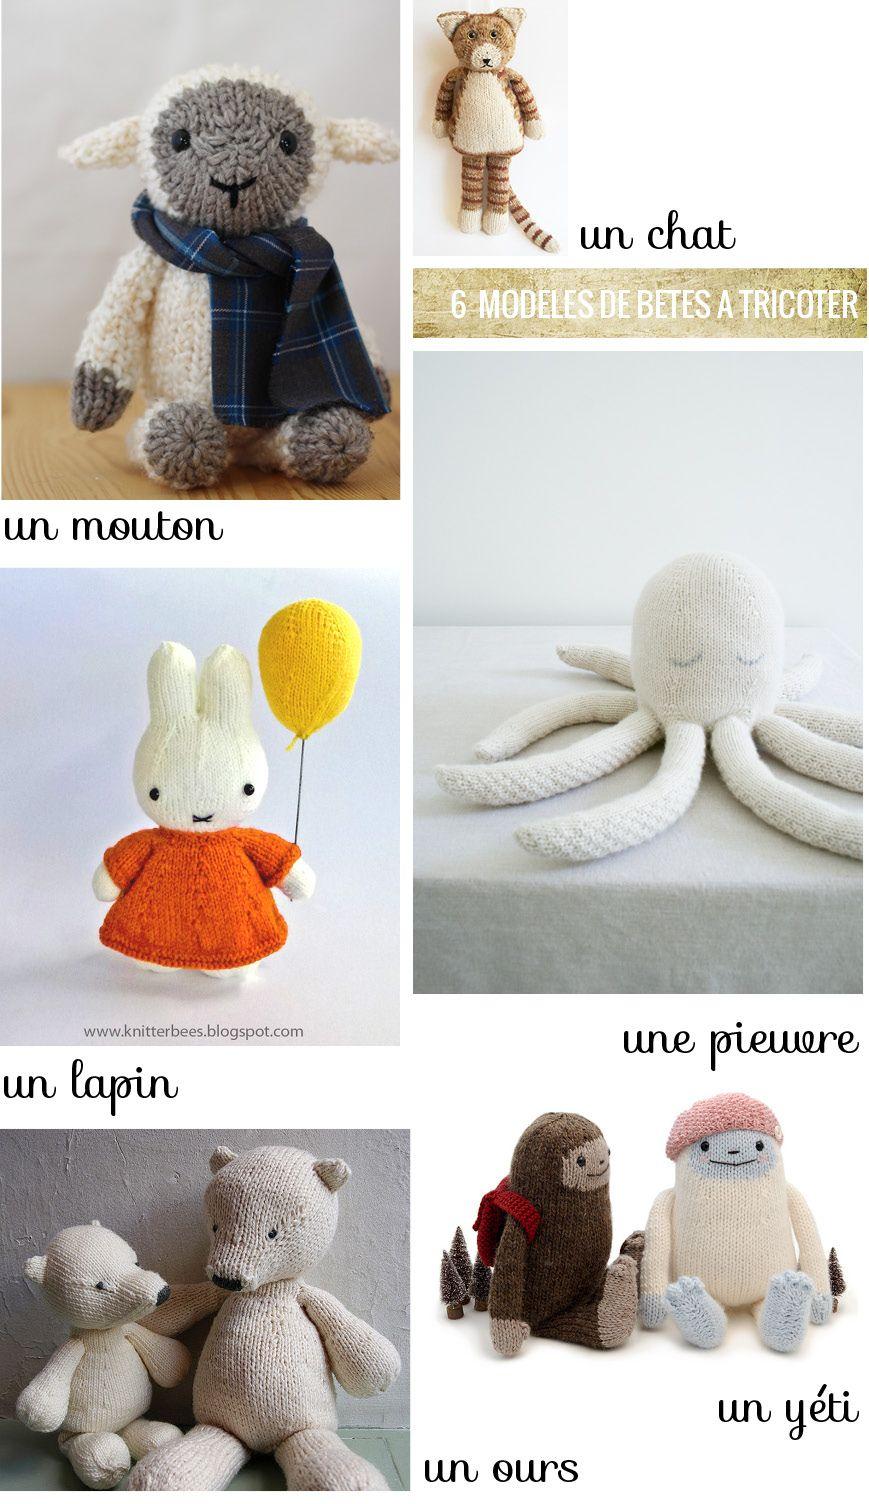 Tricoter son doudou | Crochet & Knit | Pinterest | Knitting, Crochet ...